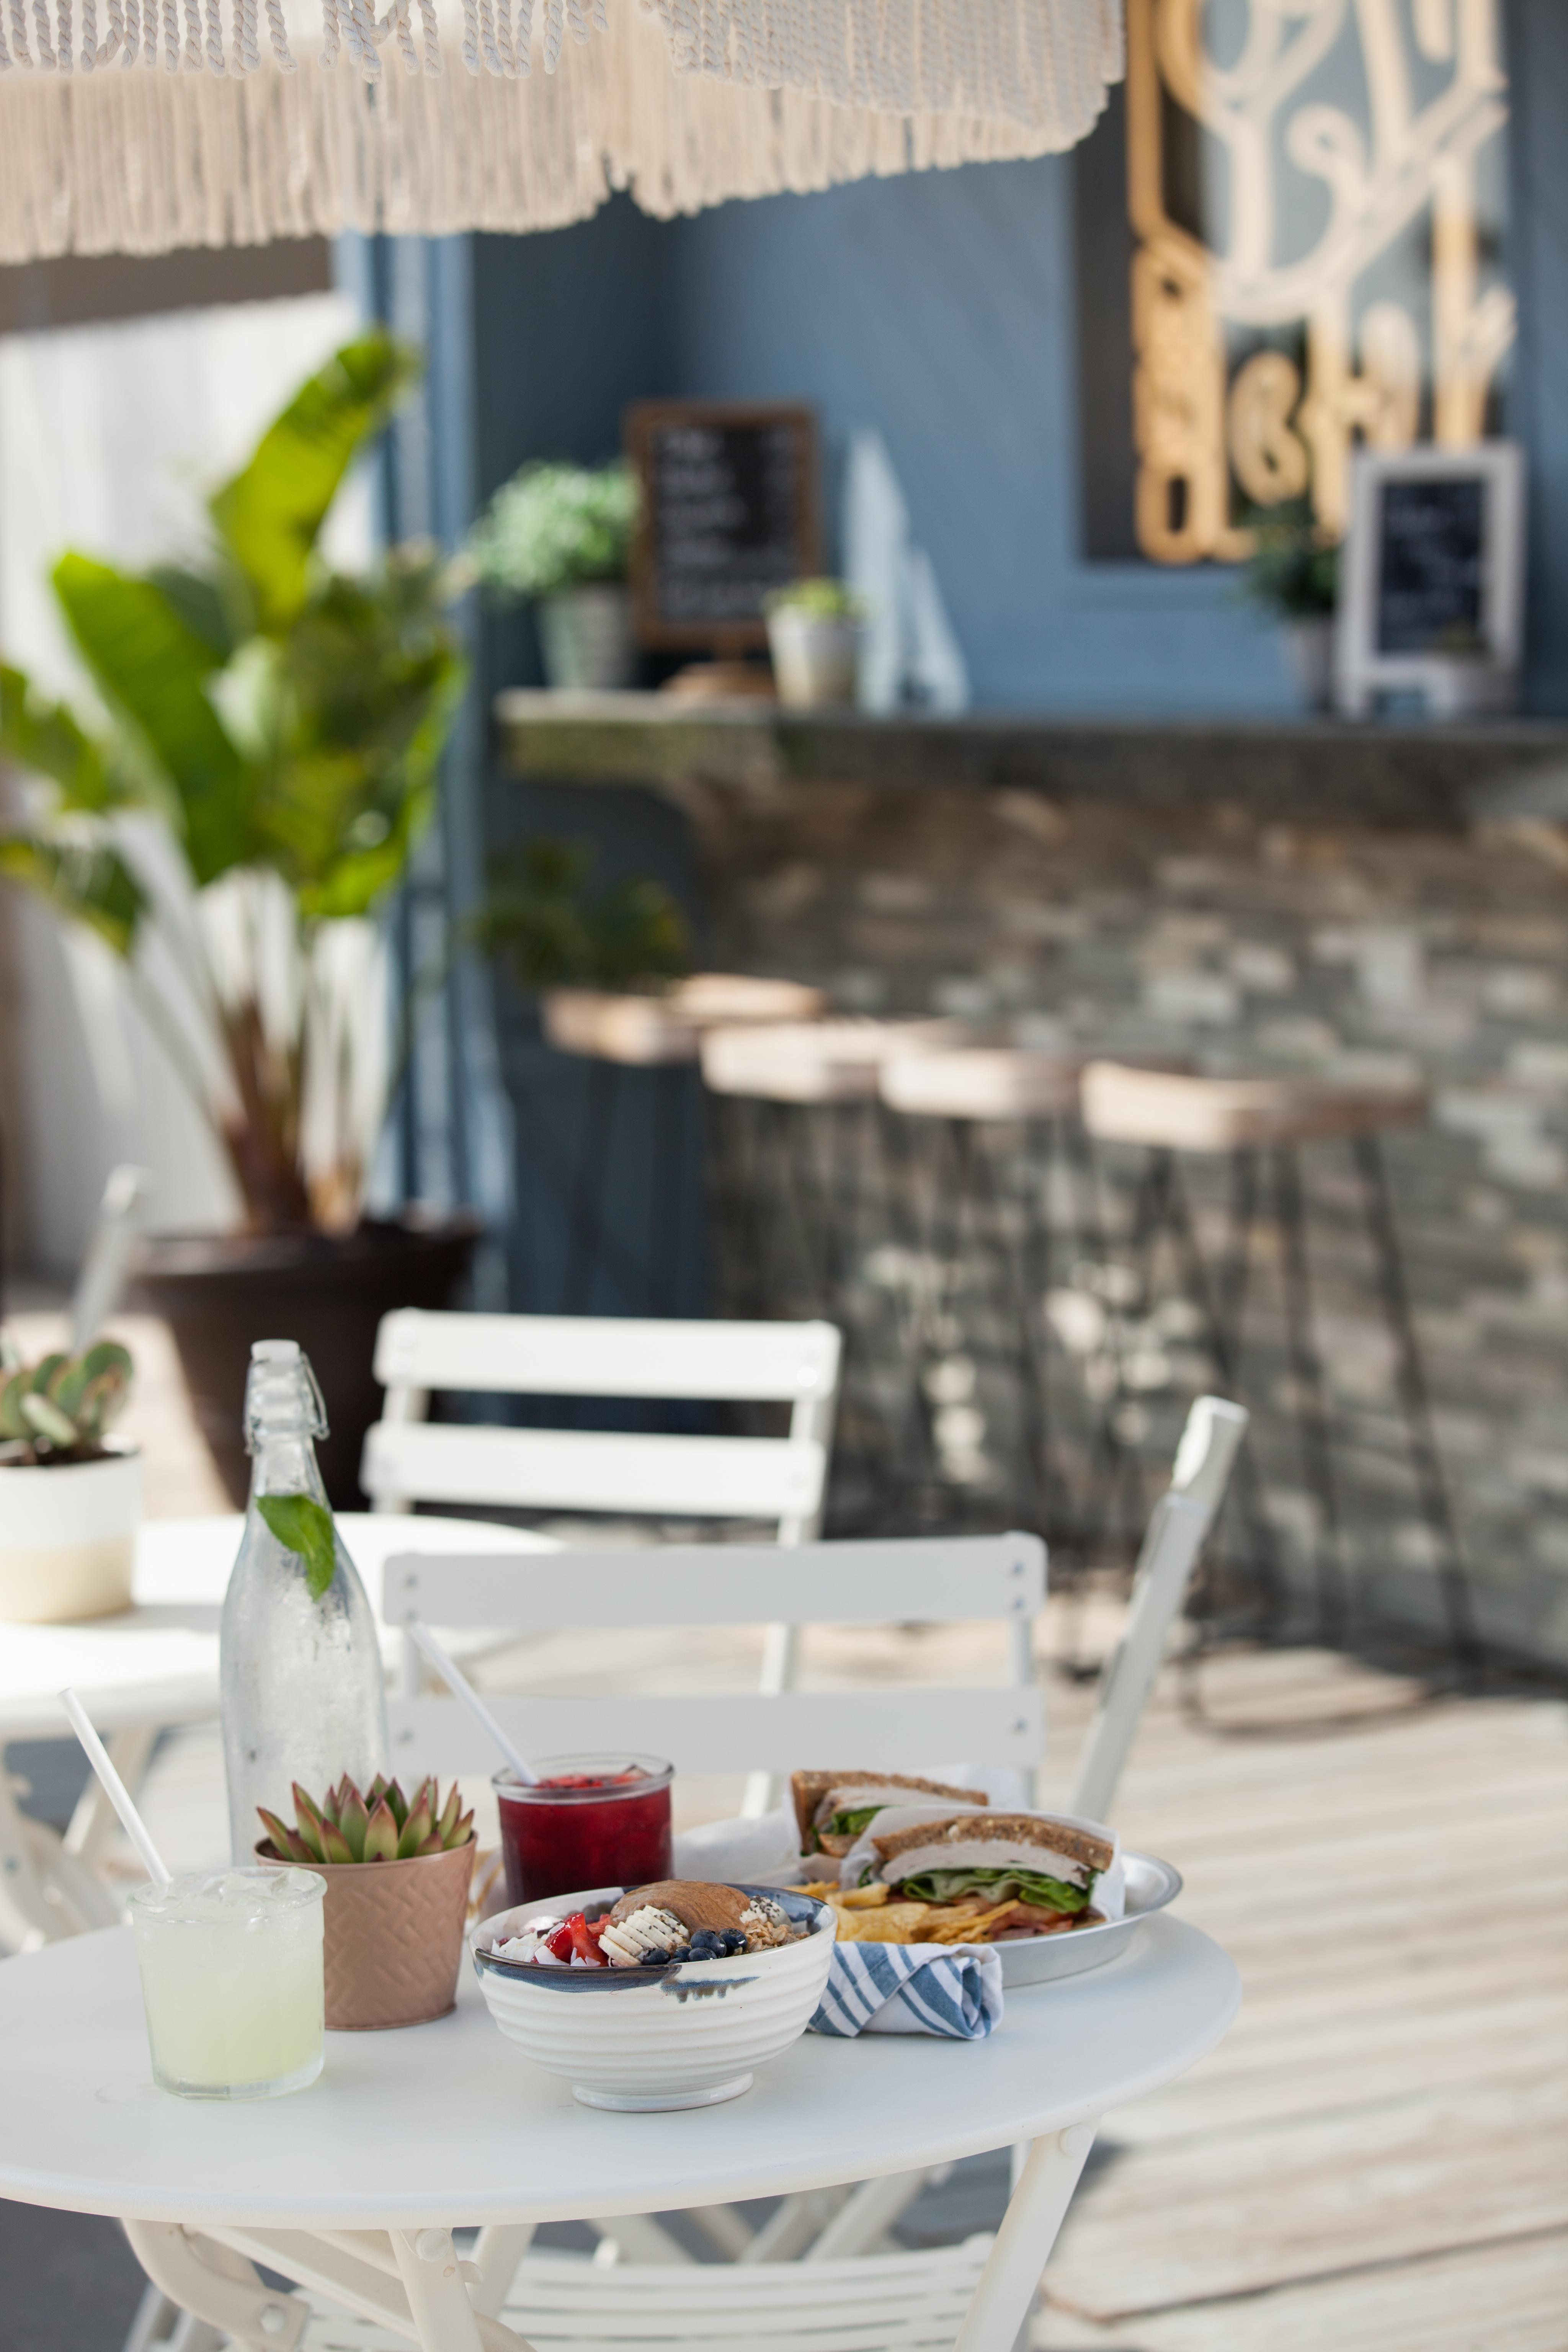 Squidly's Coffee, Sandwiches & Acai Bowls